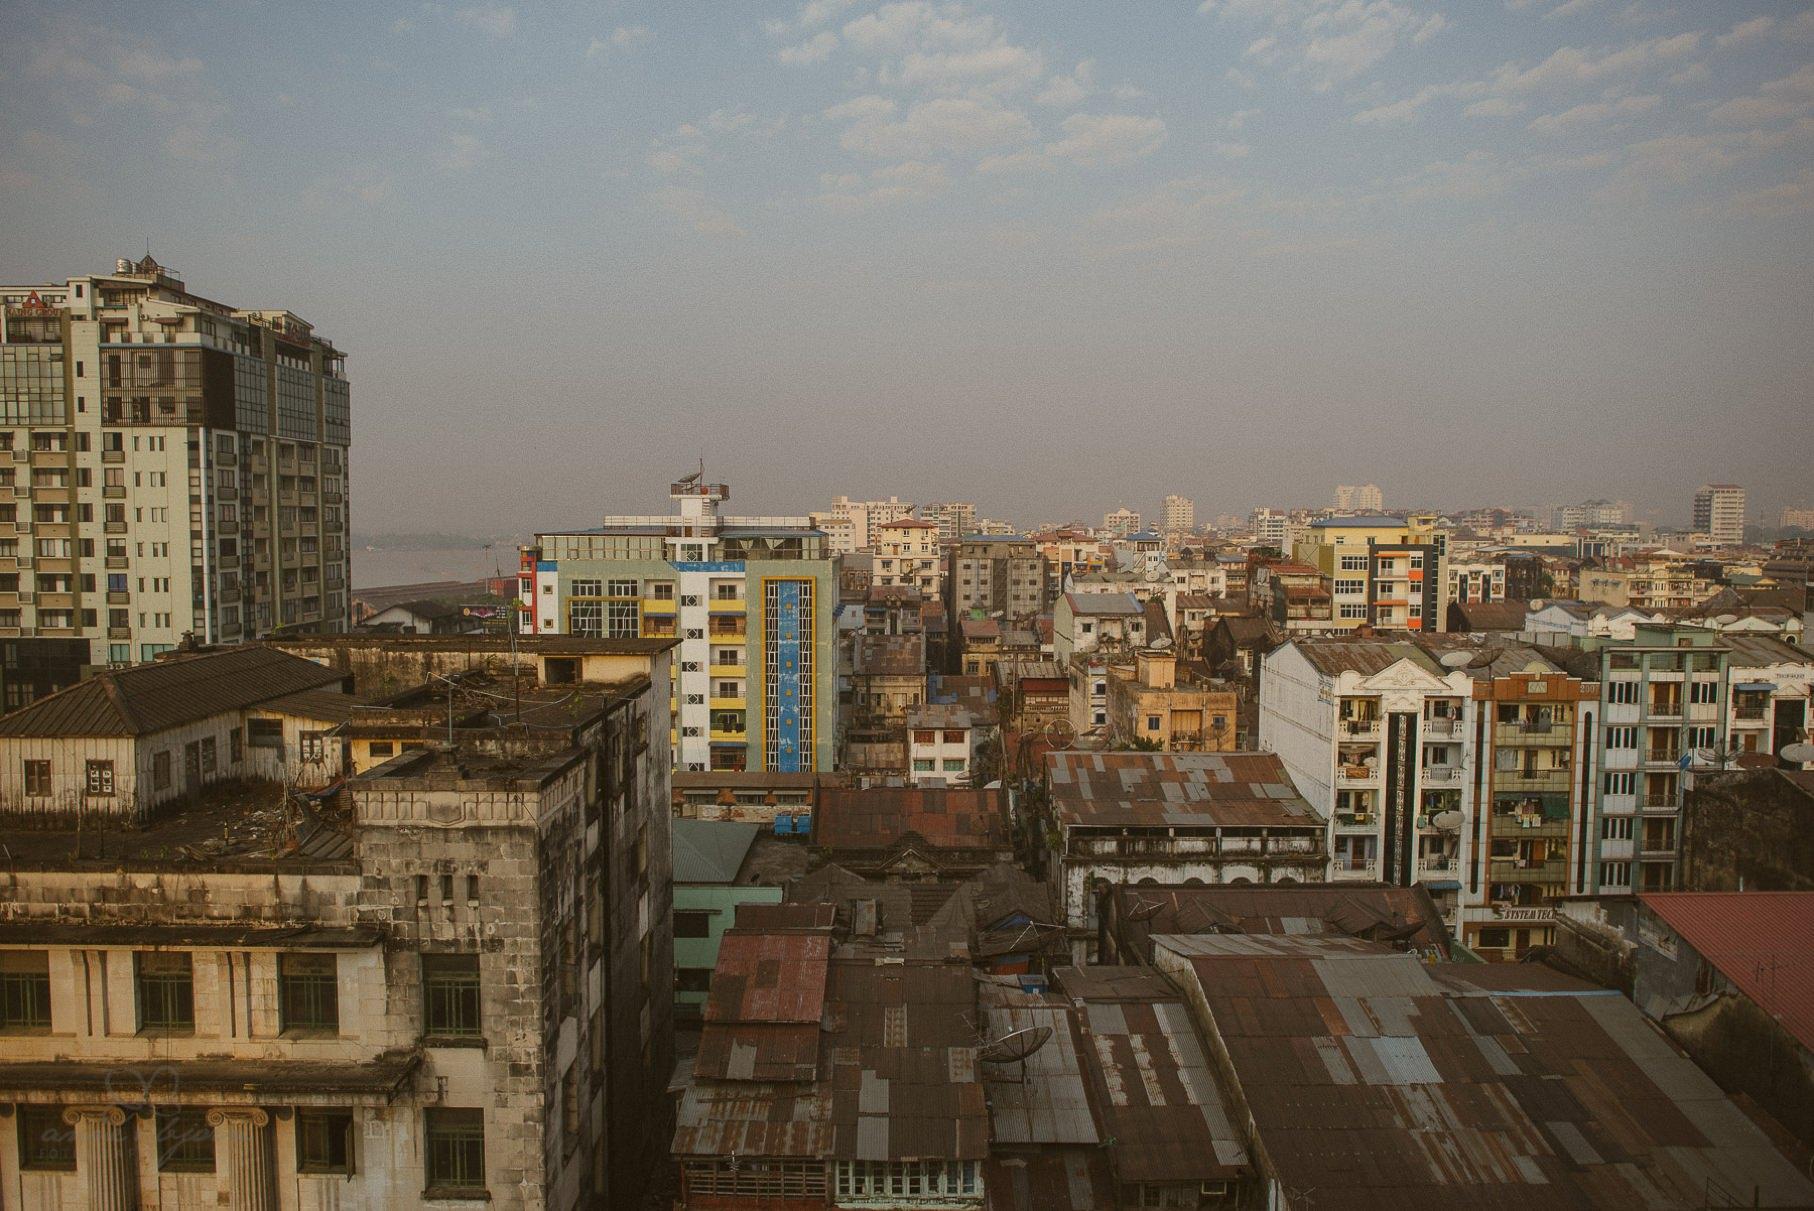 0001 yangon mandalay d76 4149 - Großstädte Myanmars - Yangon & Mandalay